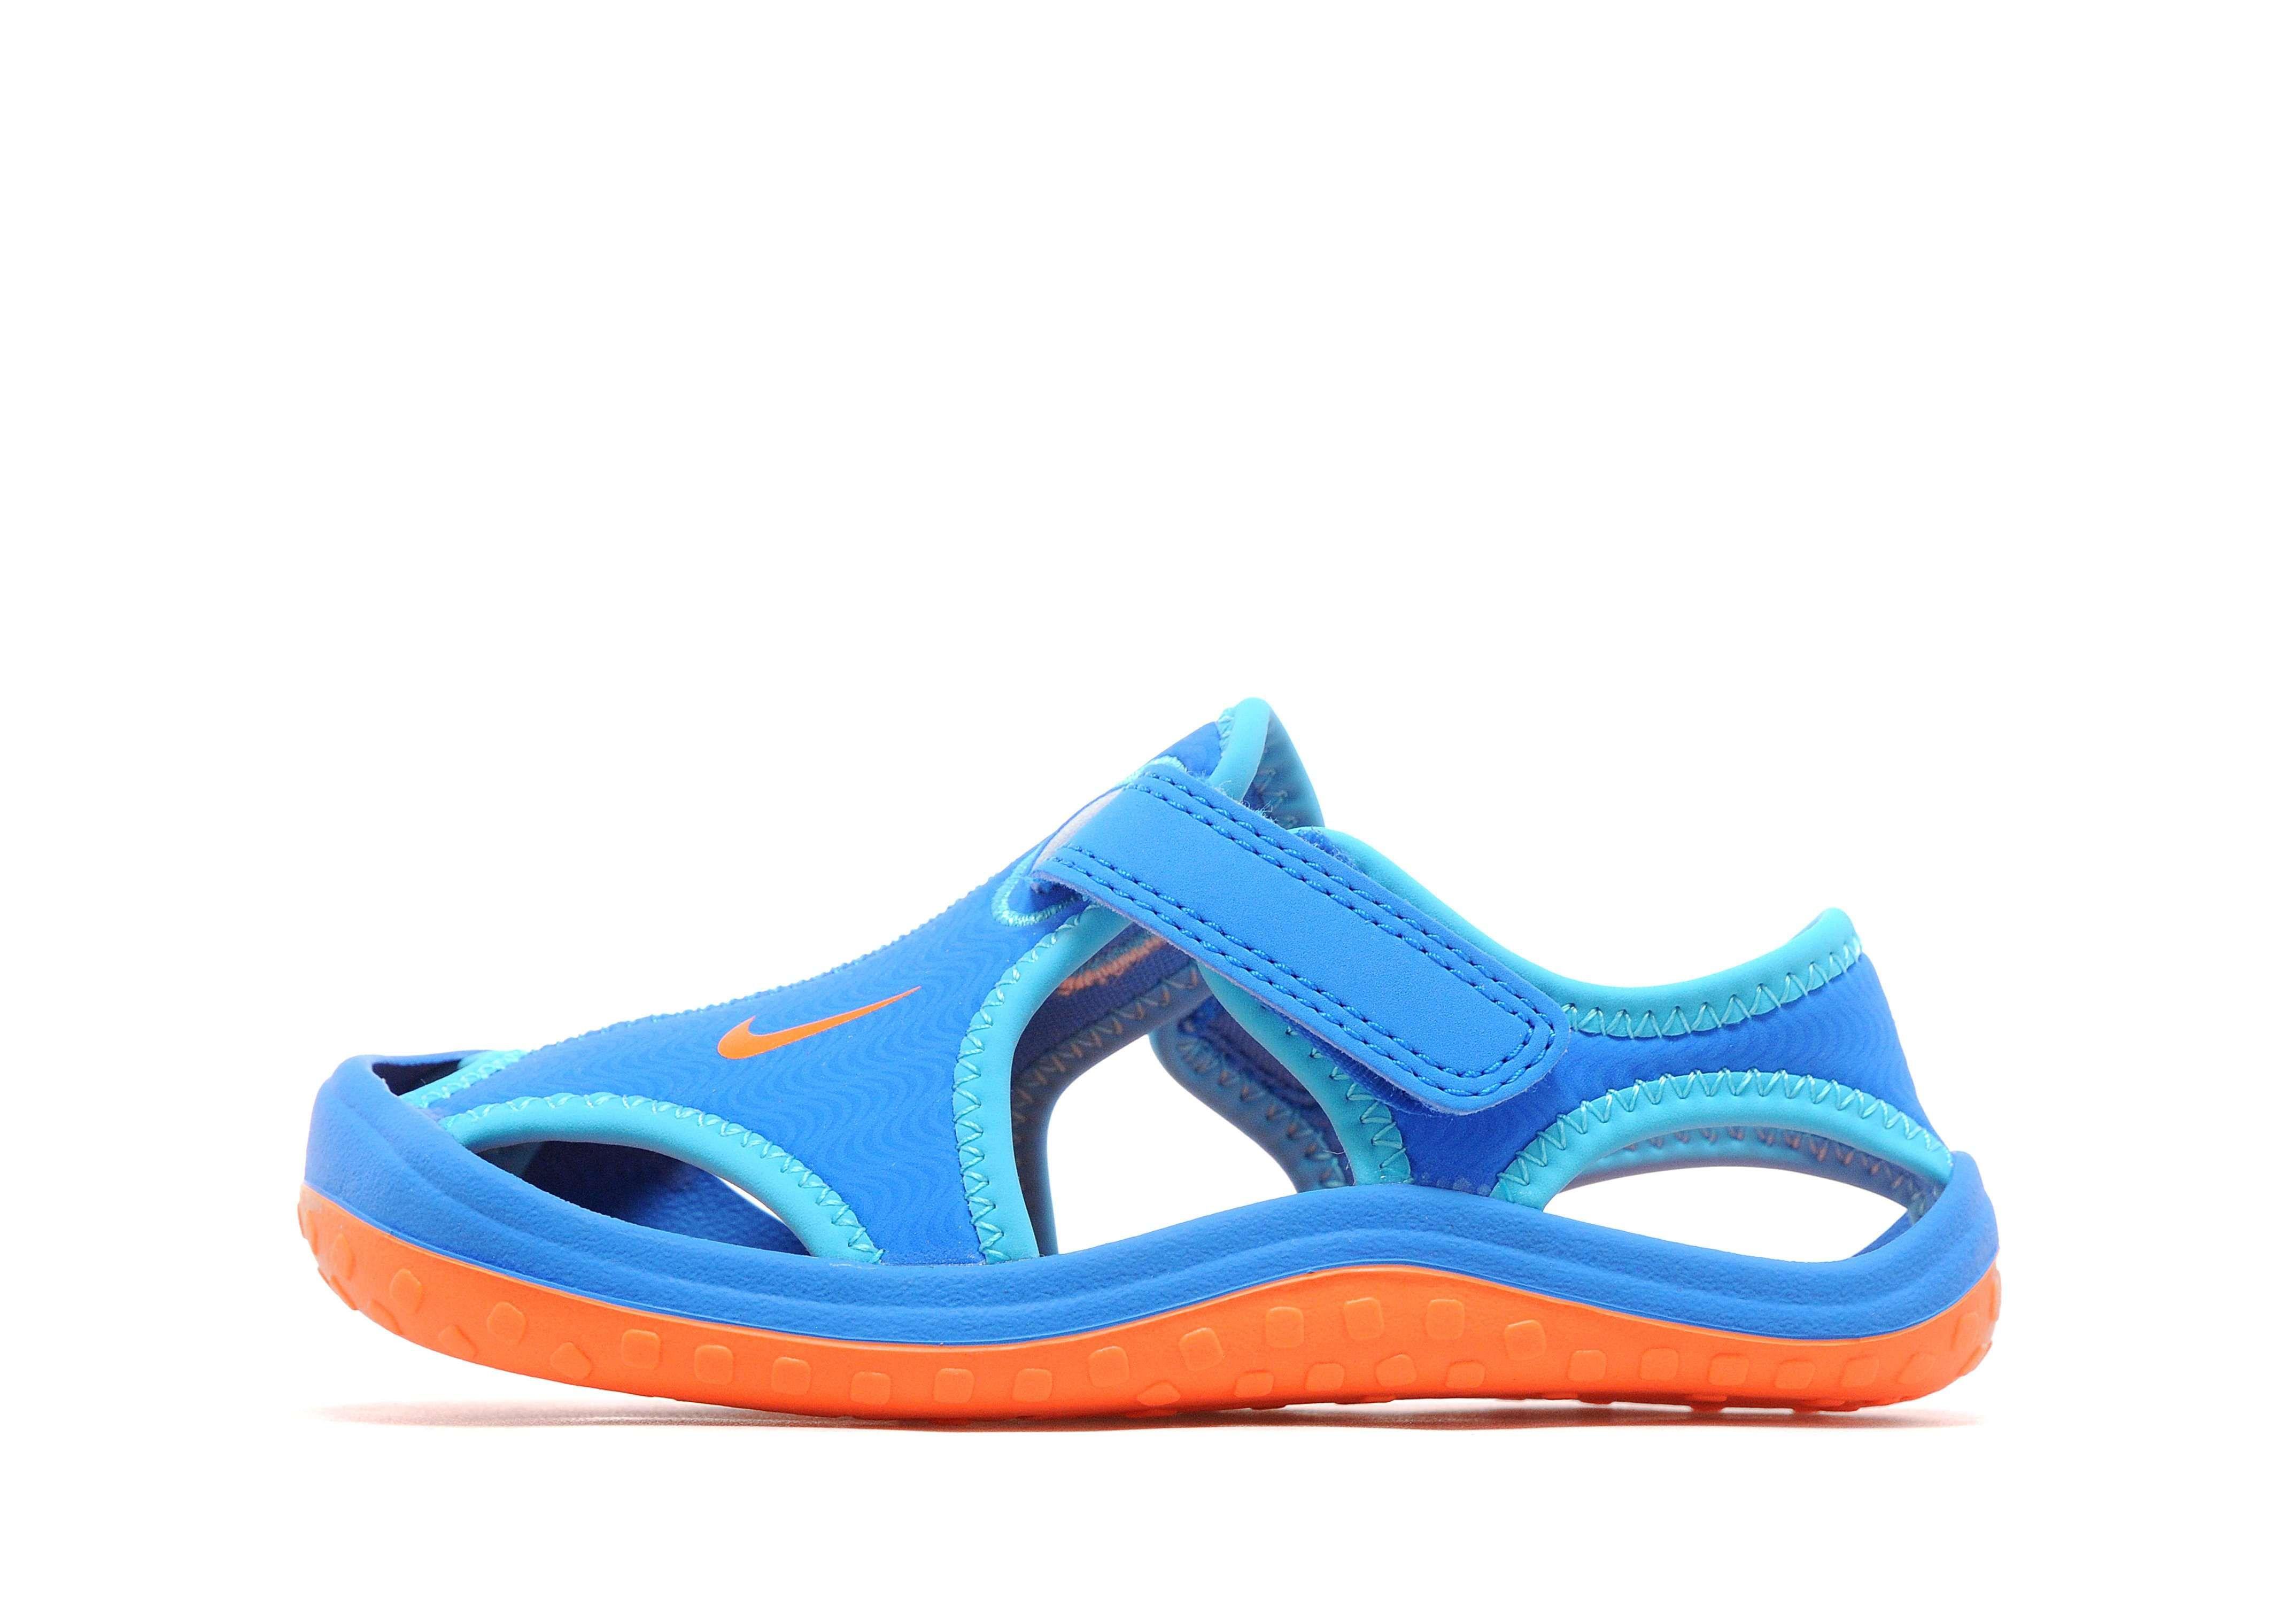 Nike Sunray Protect Infant JD Sports Jd sports, Retail